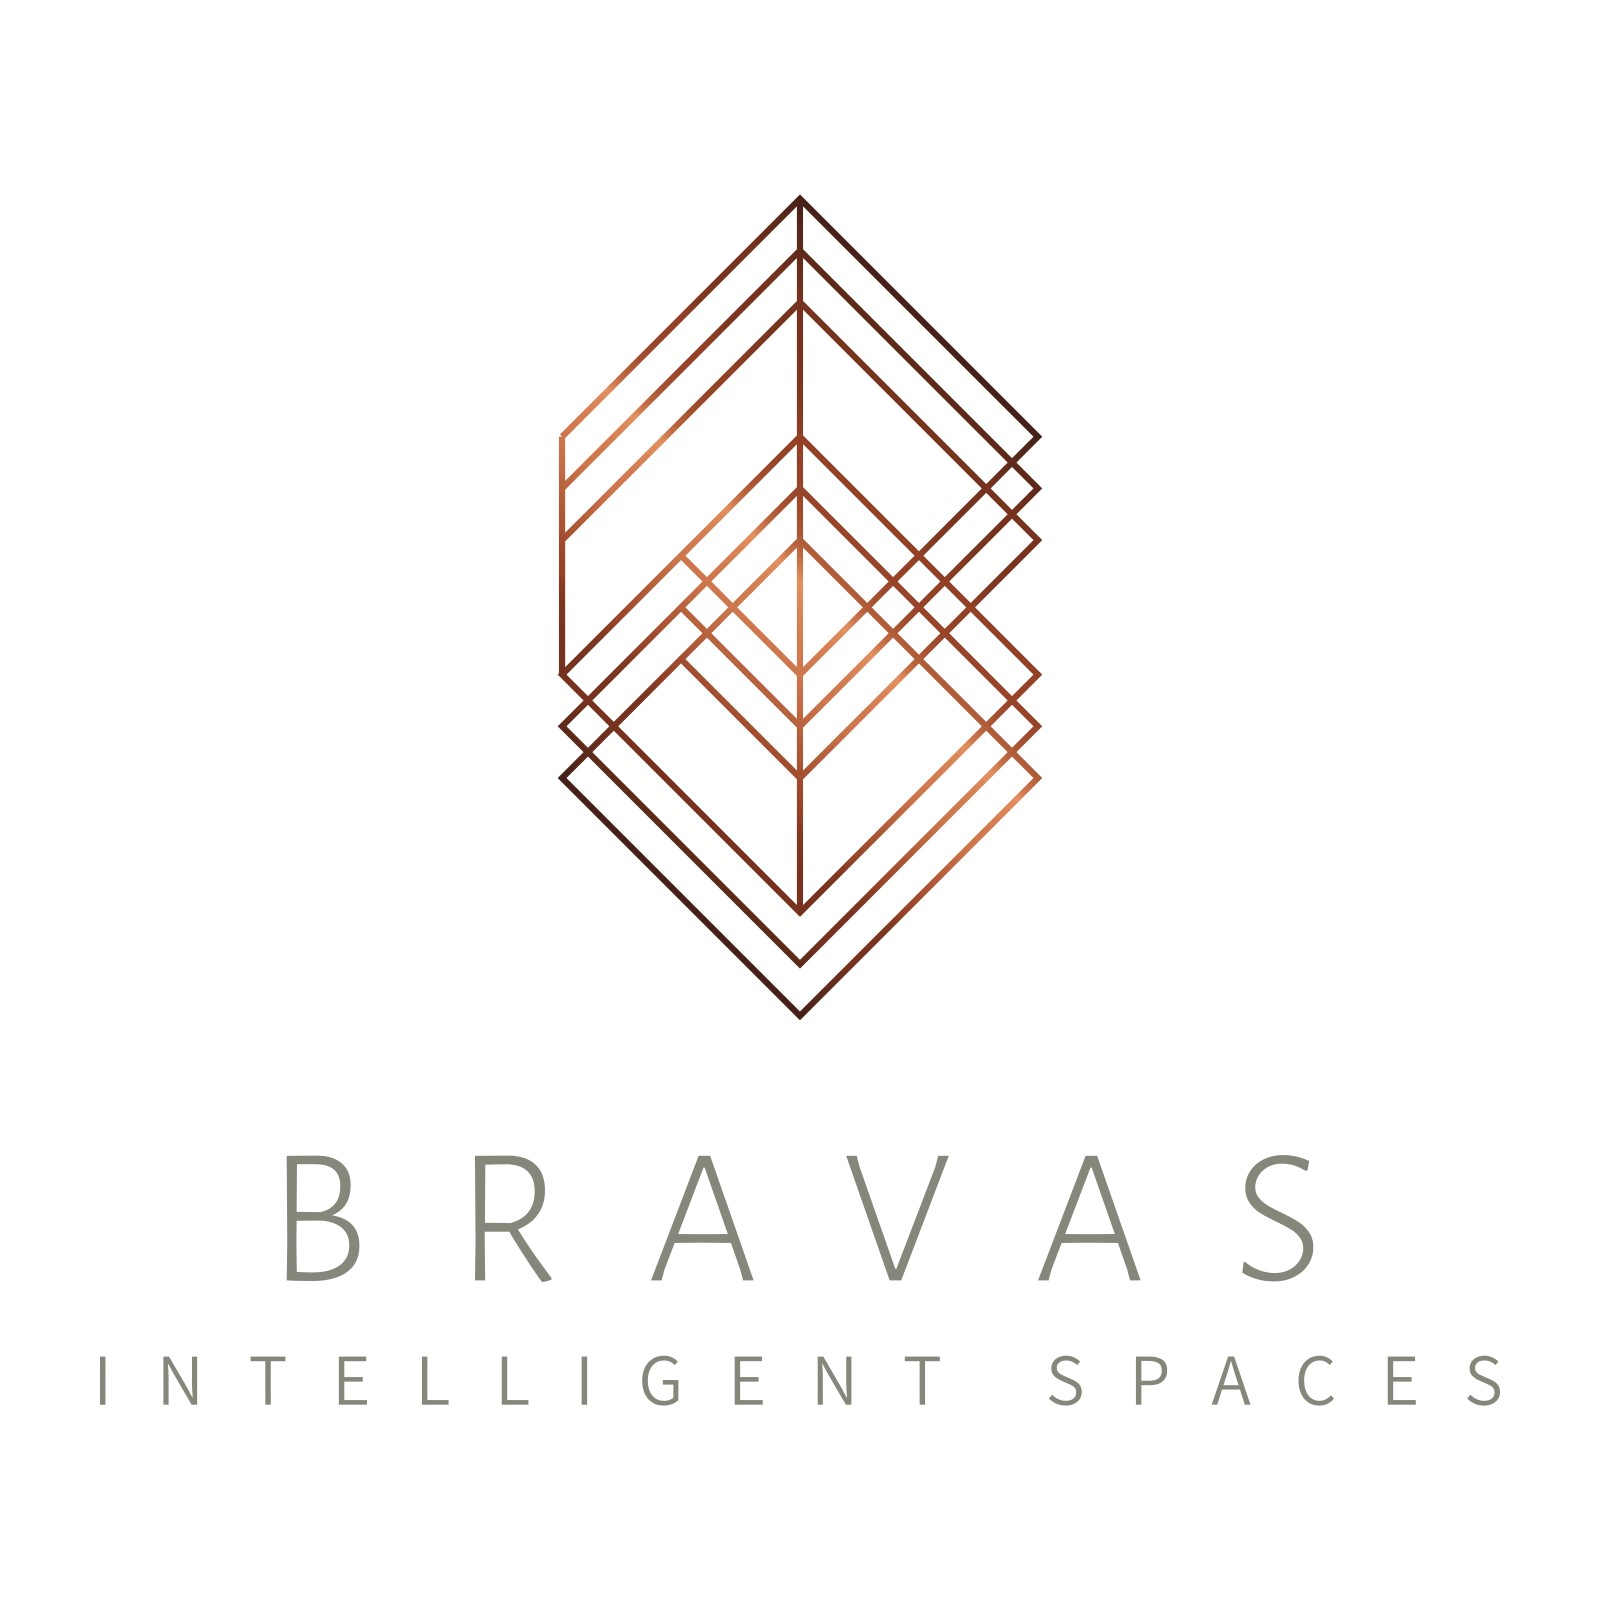 Credit Carnival - Bravas logo